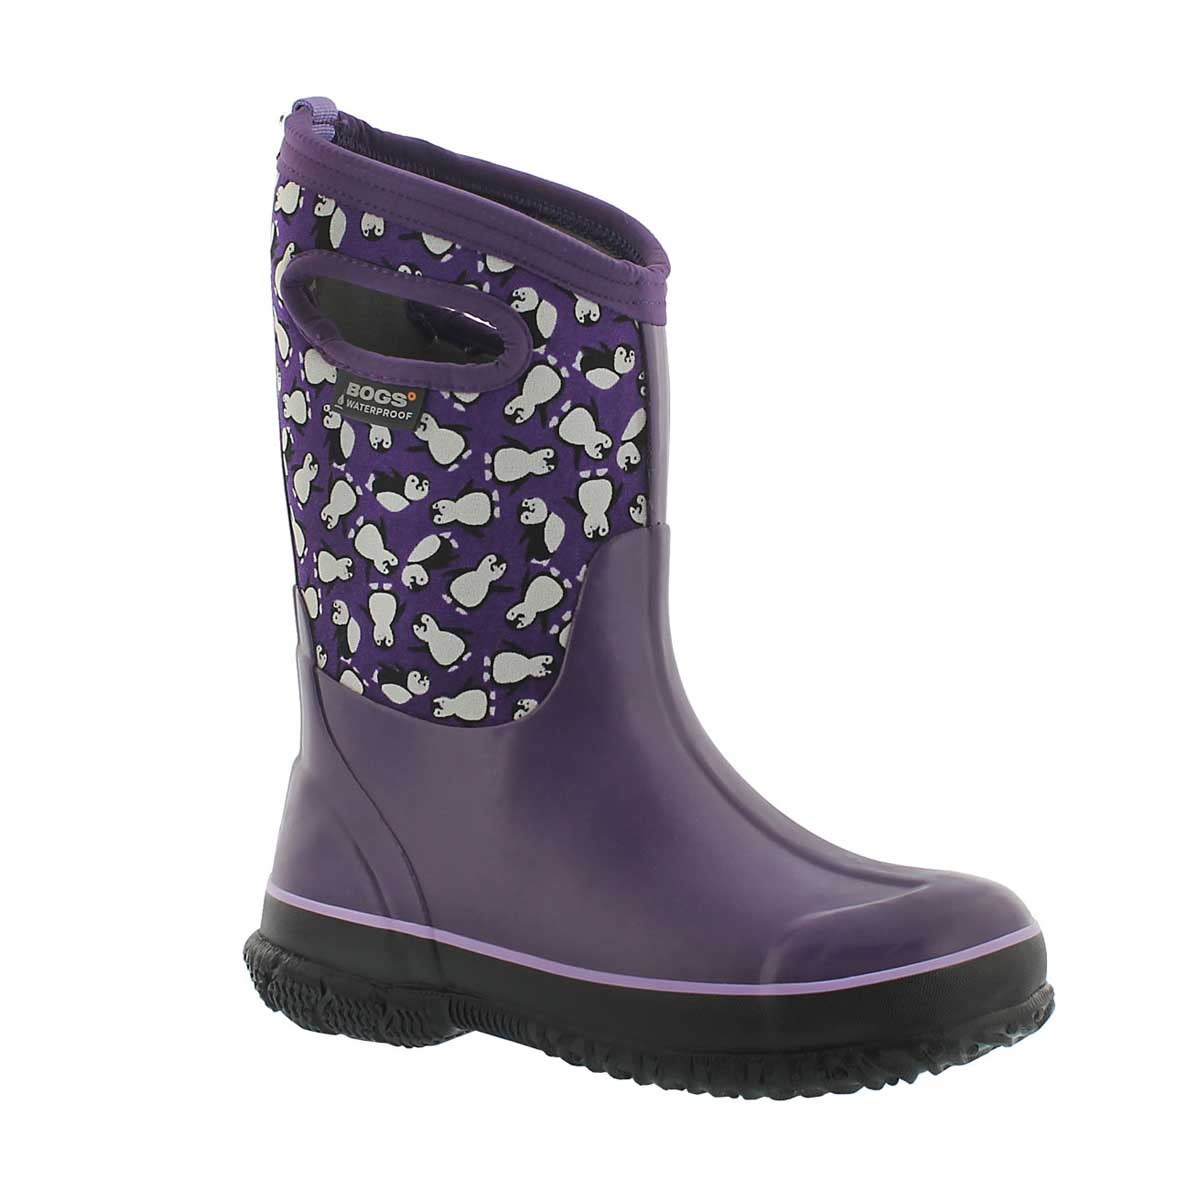 Girls' CLASSIC PENGUINS ppl multi waterproof boots